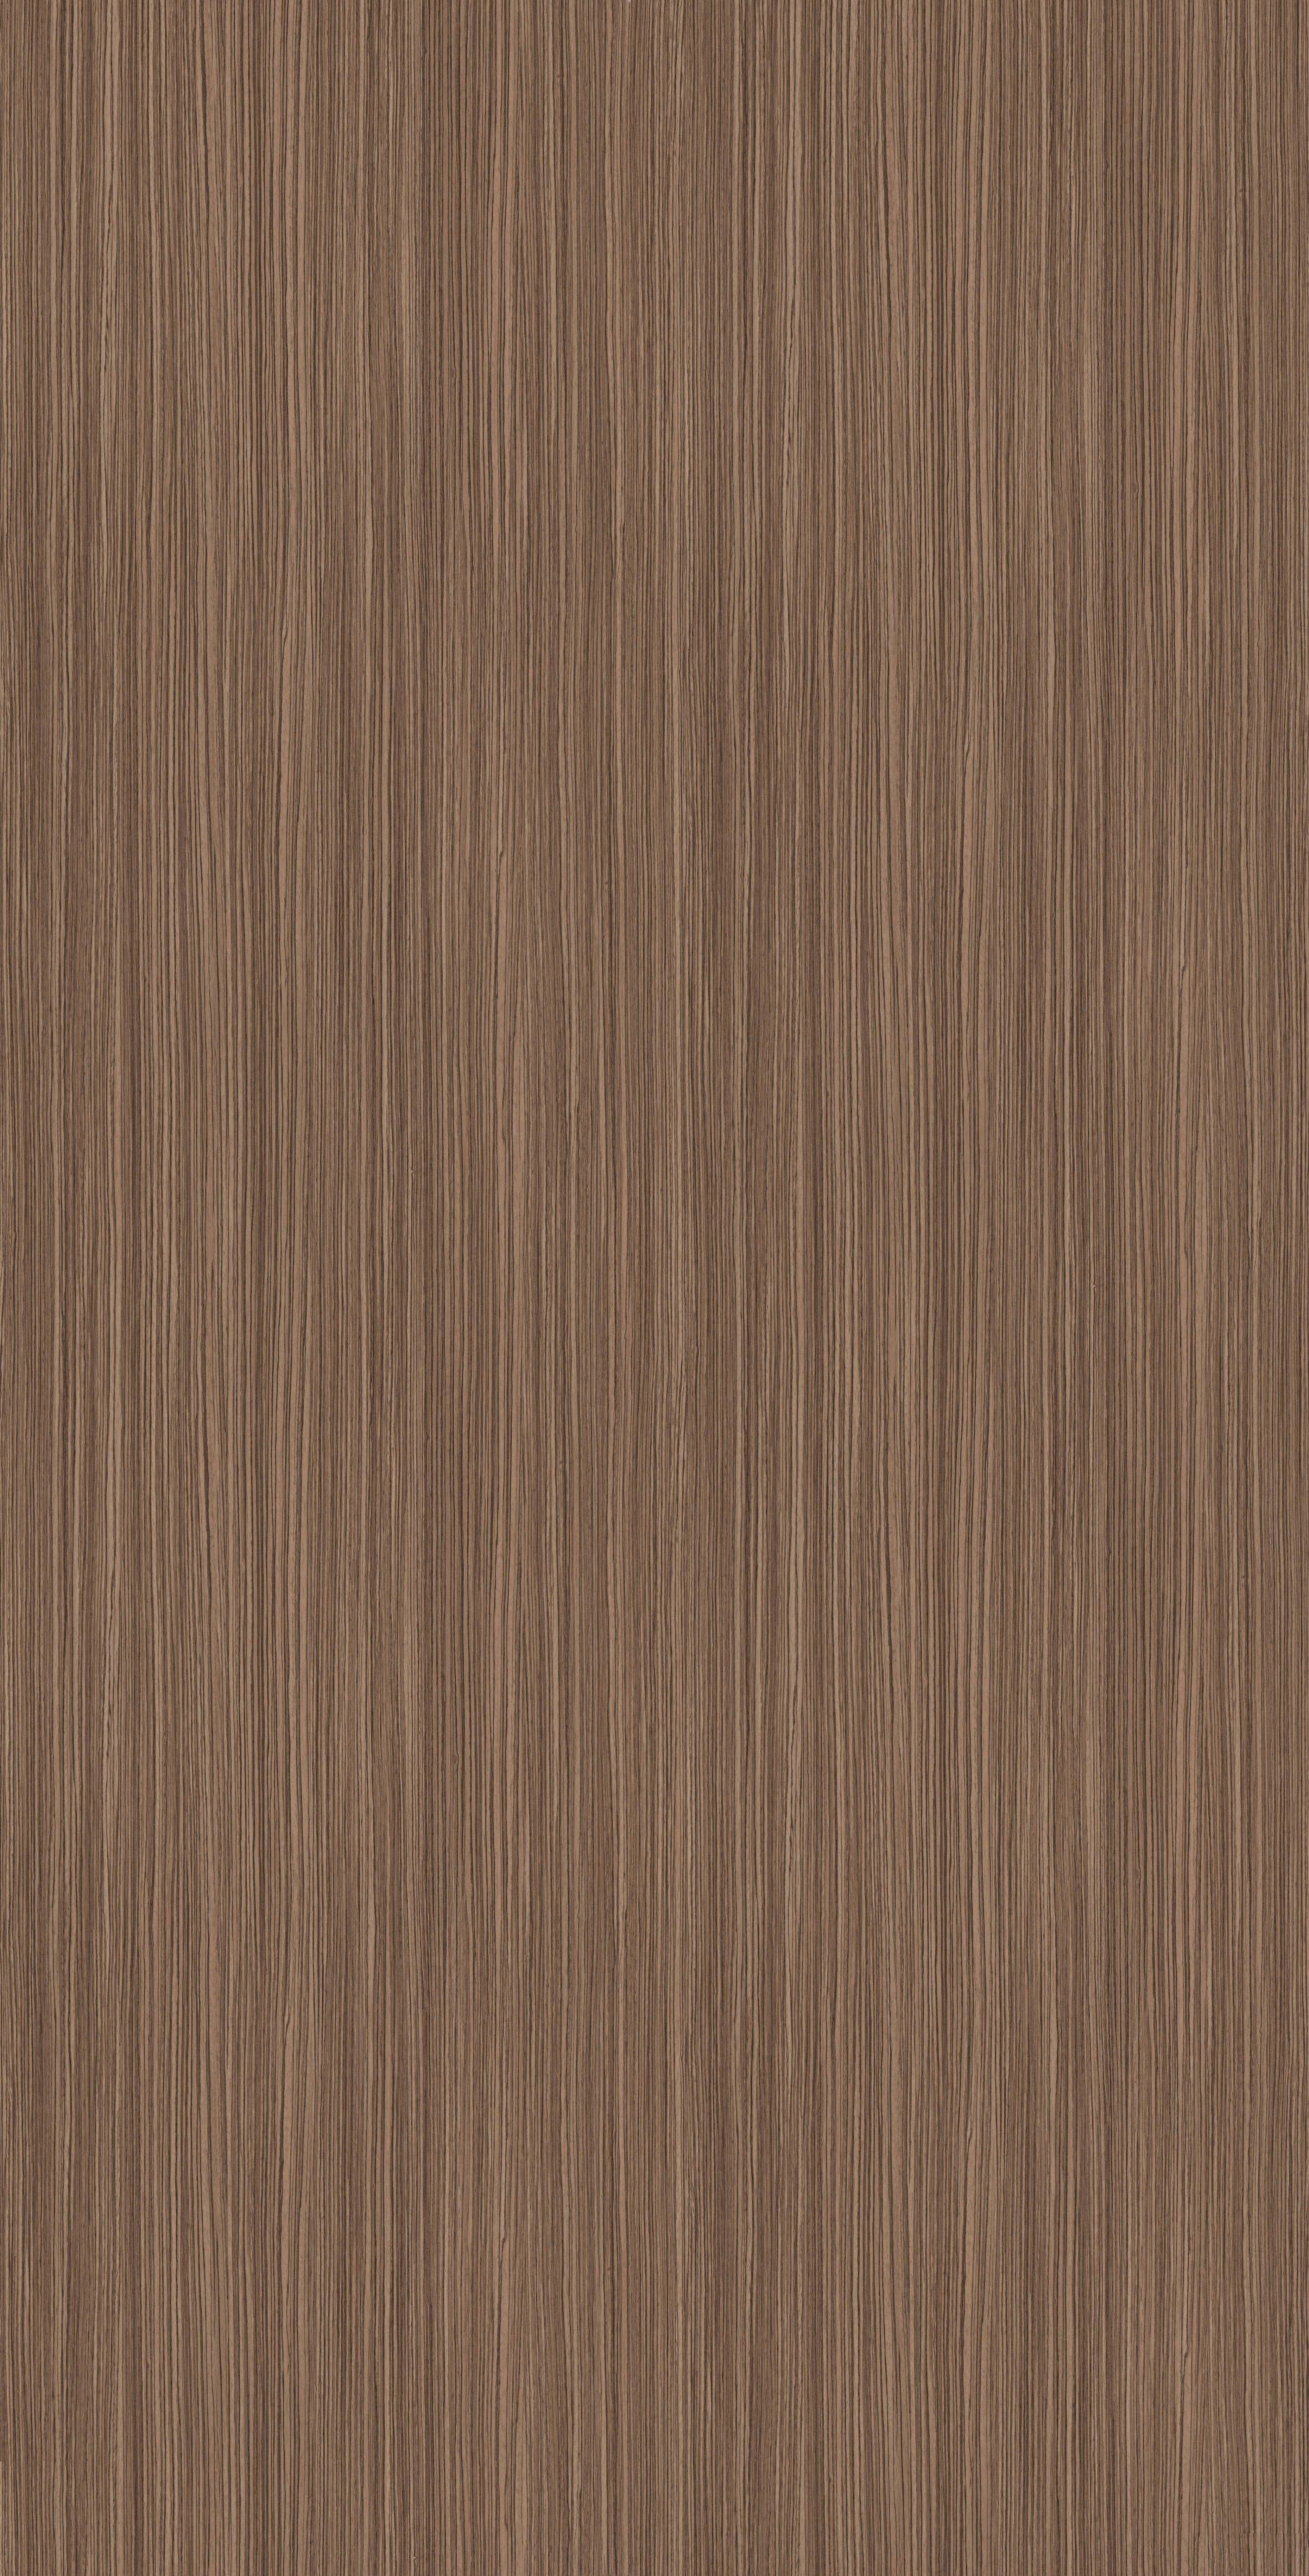 formica perform 0586 brown